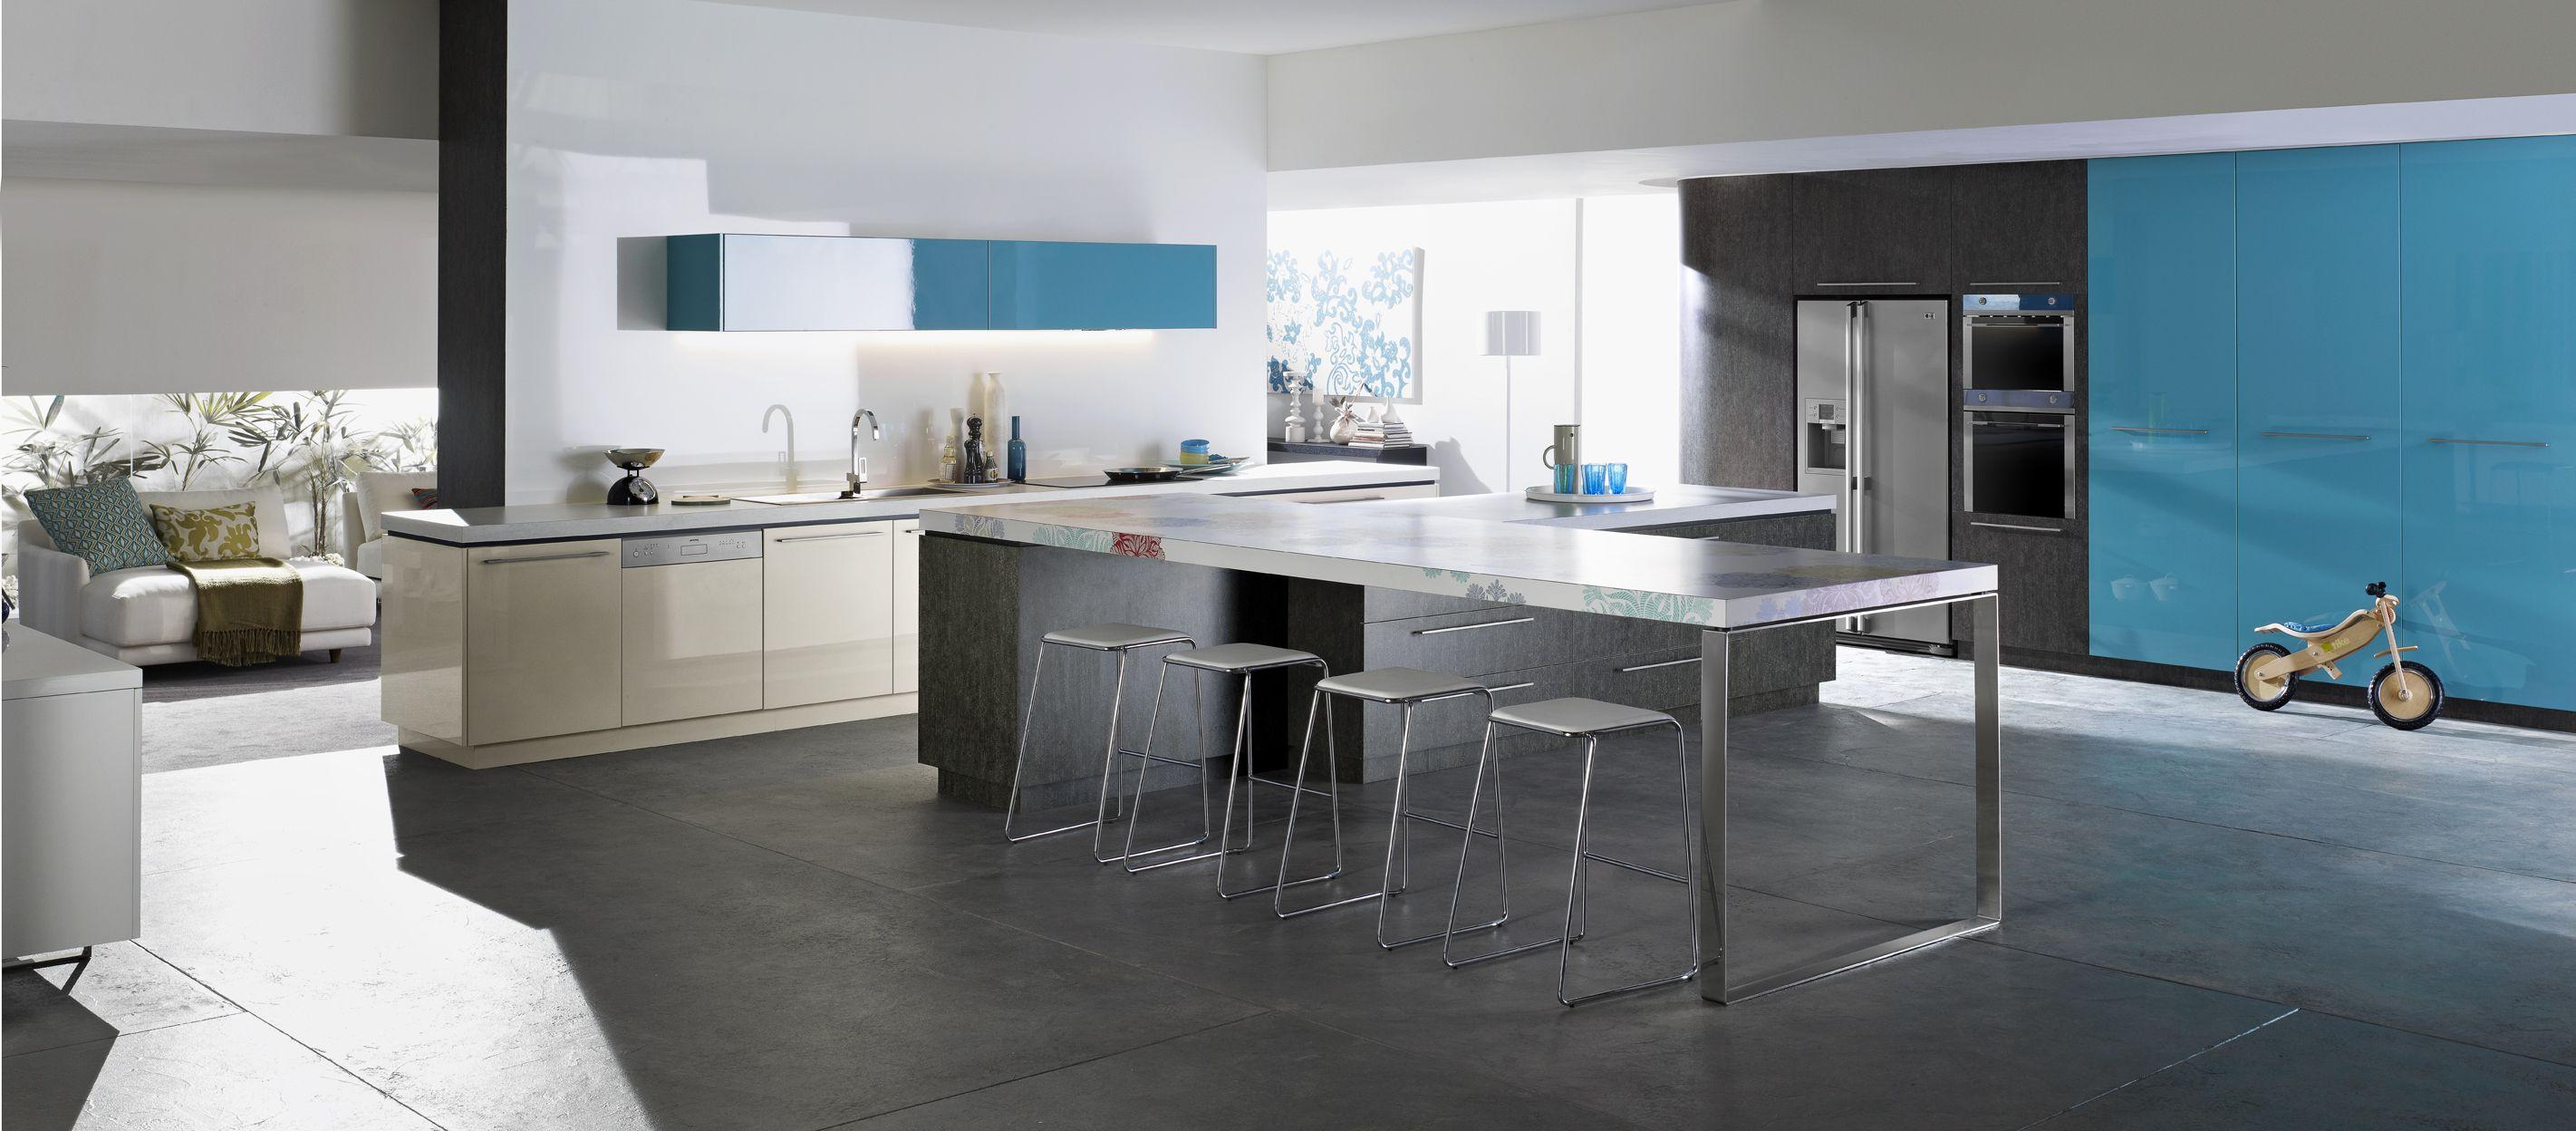 Küchen design pop front benchtop laminex fusion cantata back benchtop laminex